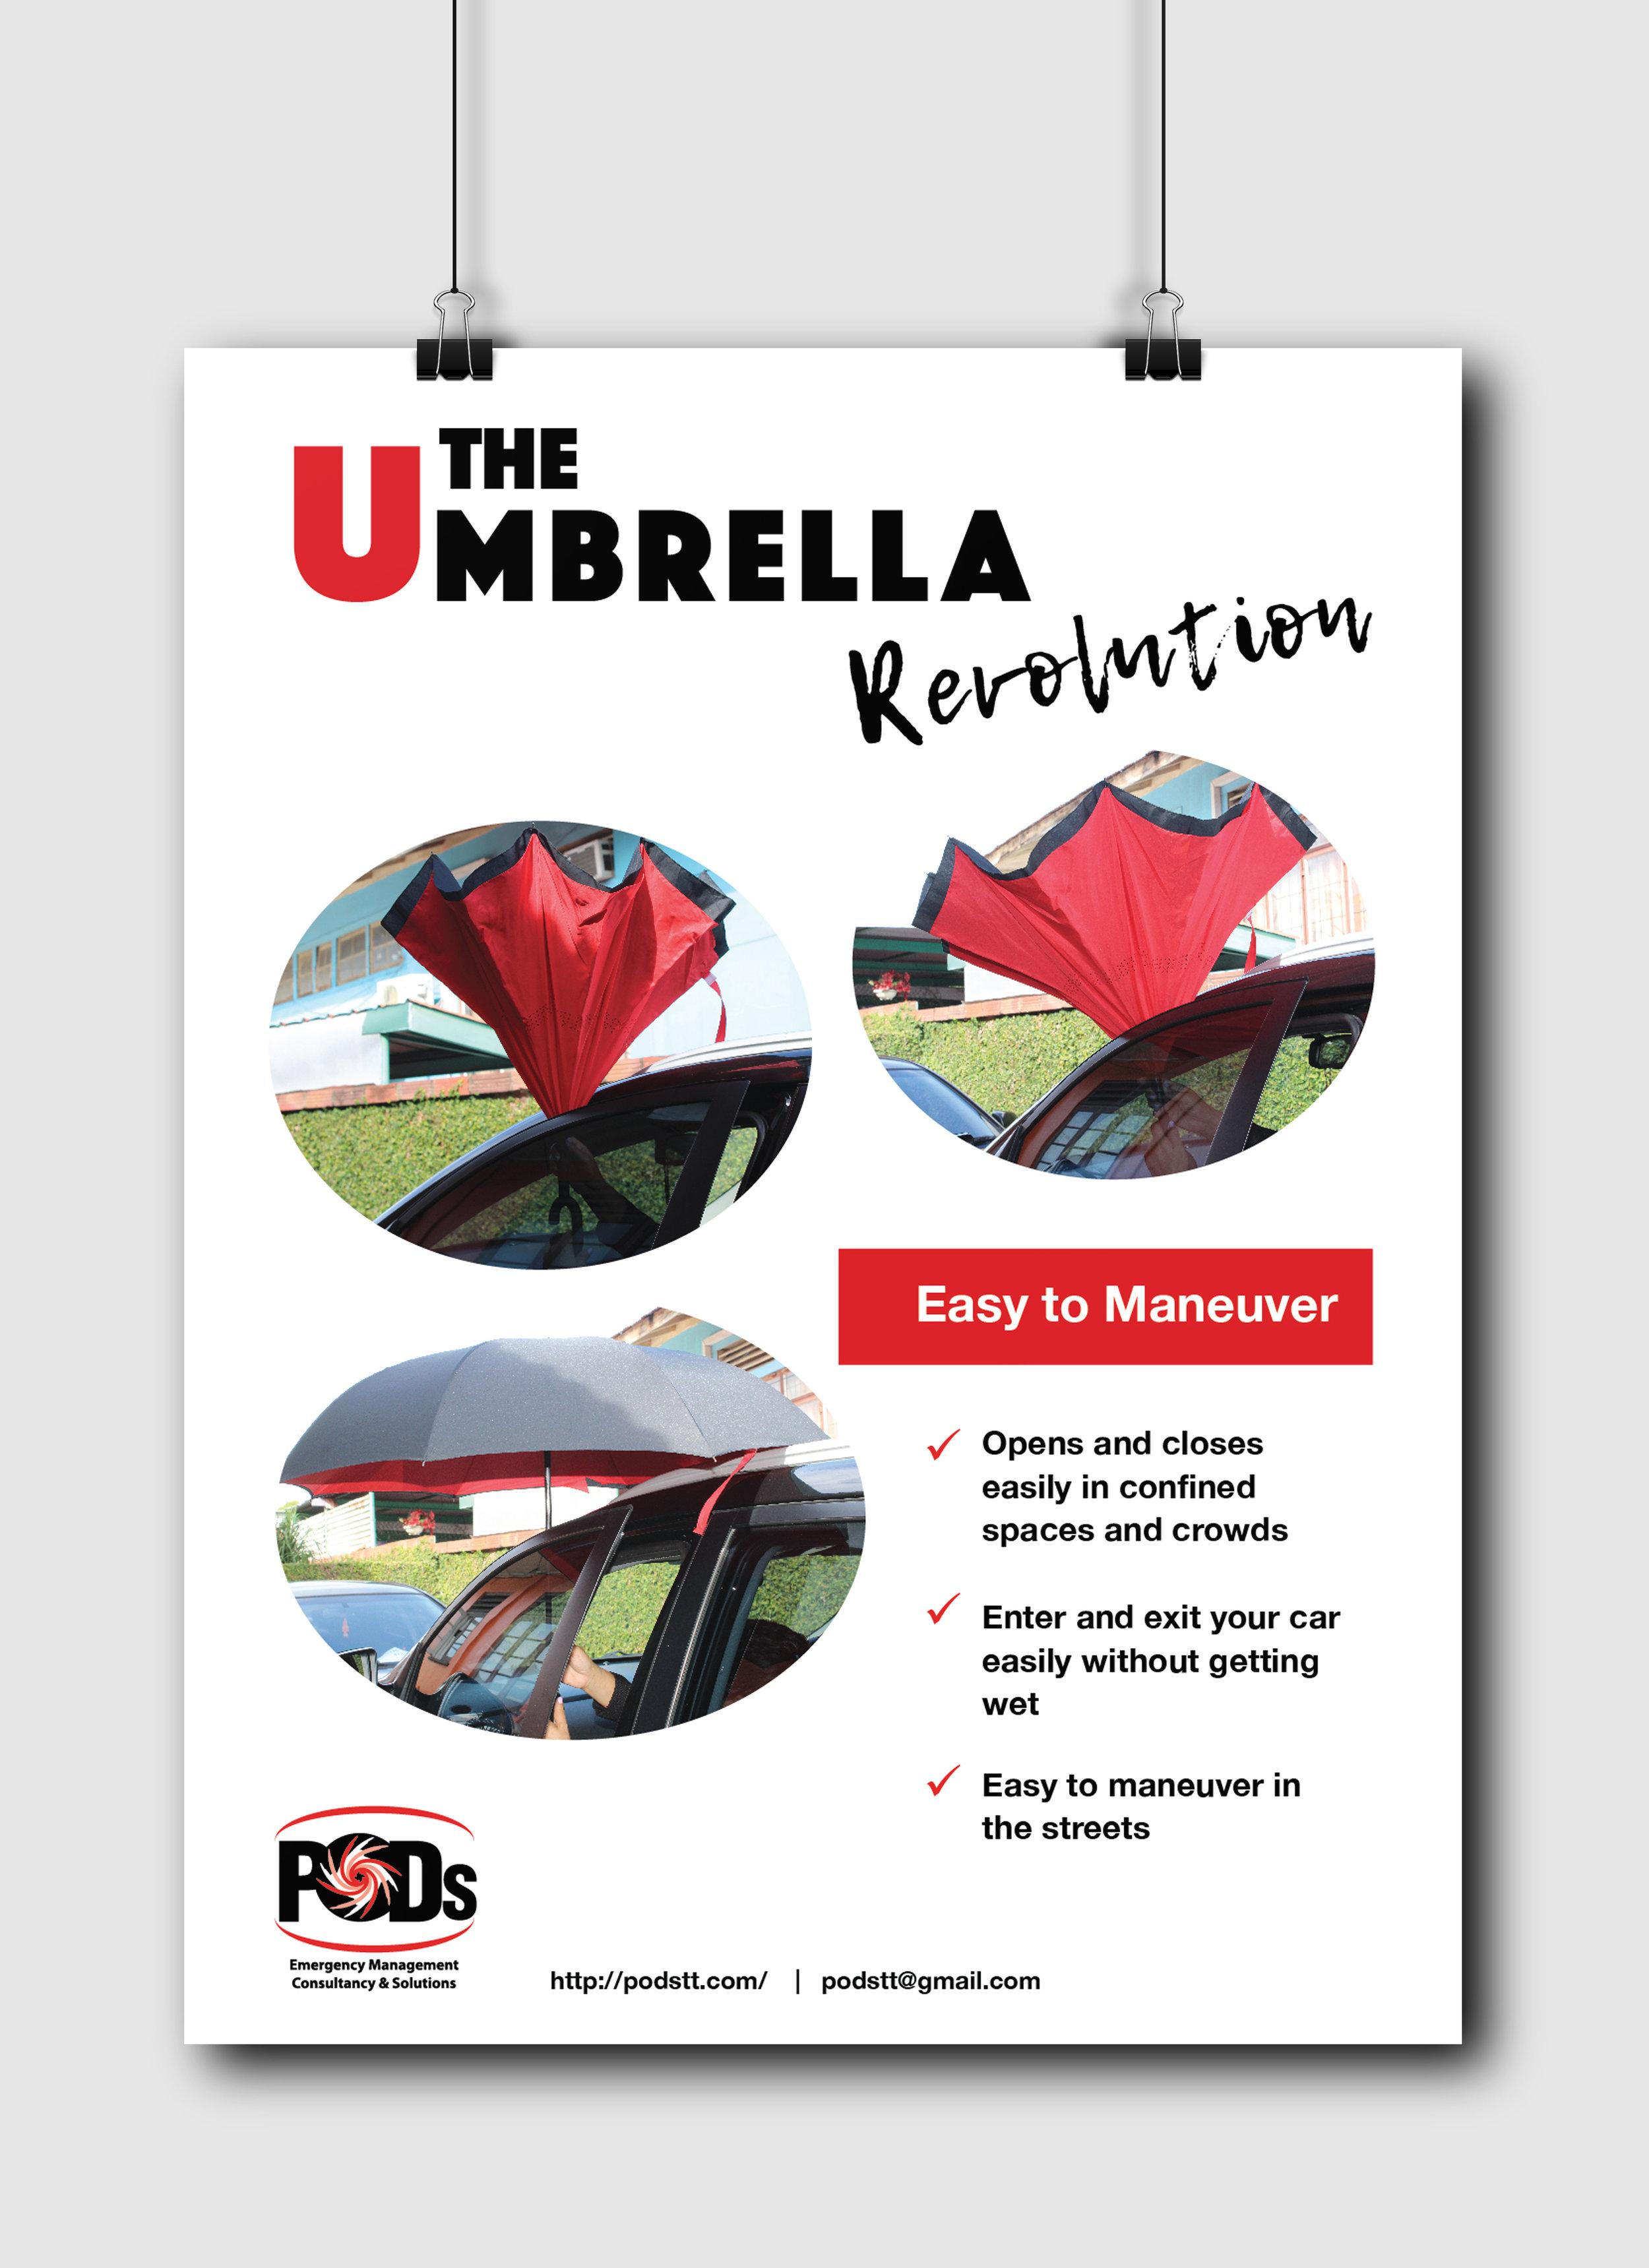 UmbrellaPods_1.jpg